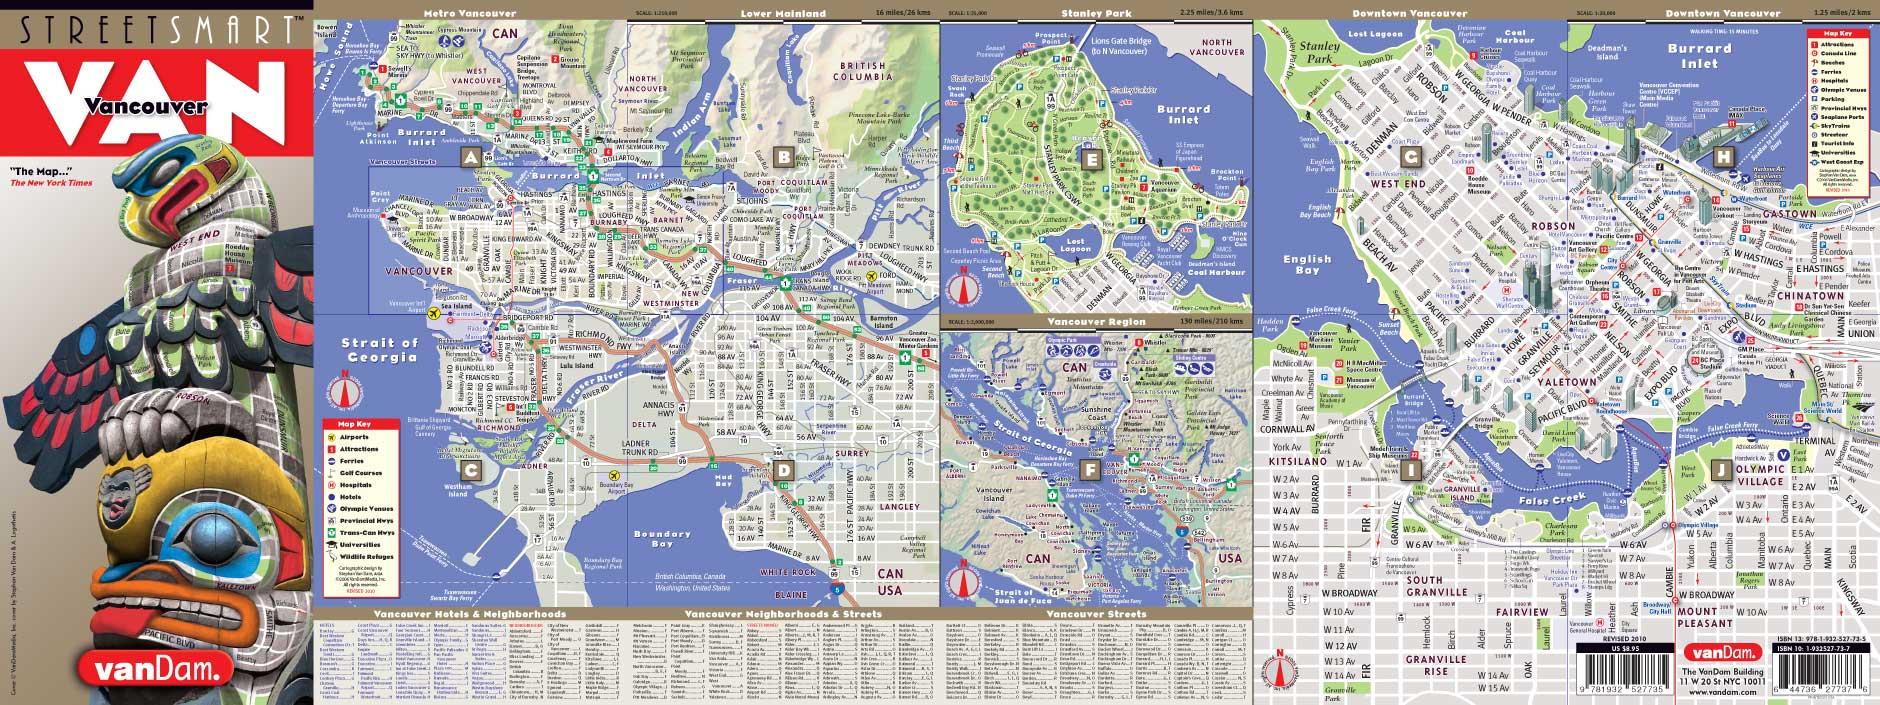 Vancouver Map By VanDam Vancouver StreetSmart Map City Street - Nyc unfolds map